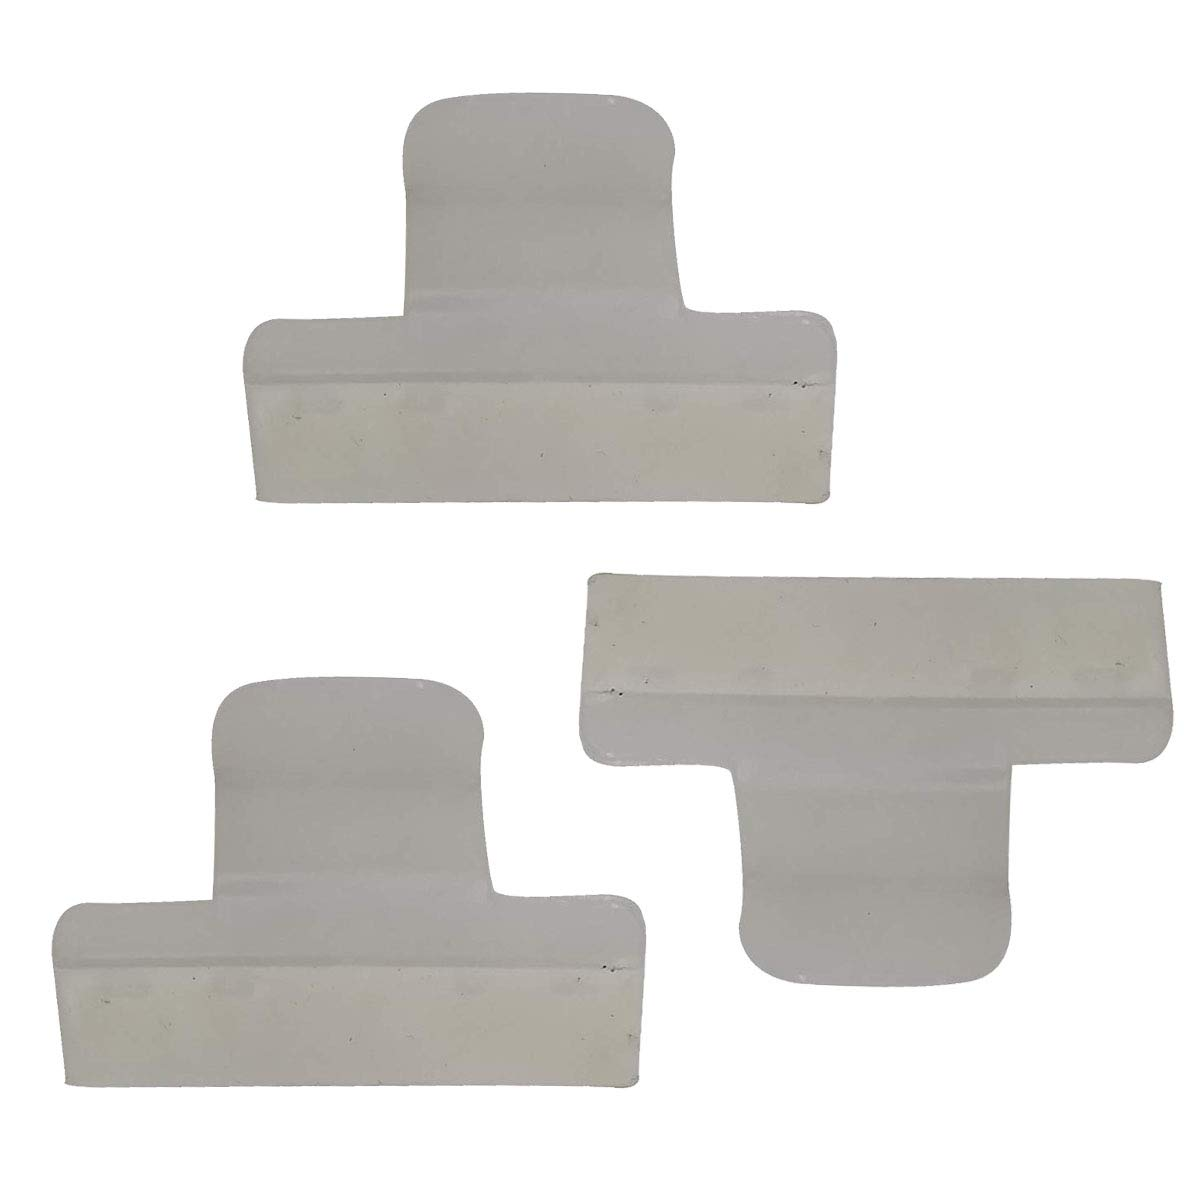 Dishwasher Splash Shield for Frigidaire Electrolux AP4338941 PS2203346 154701001